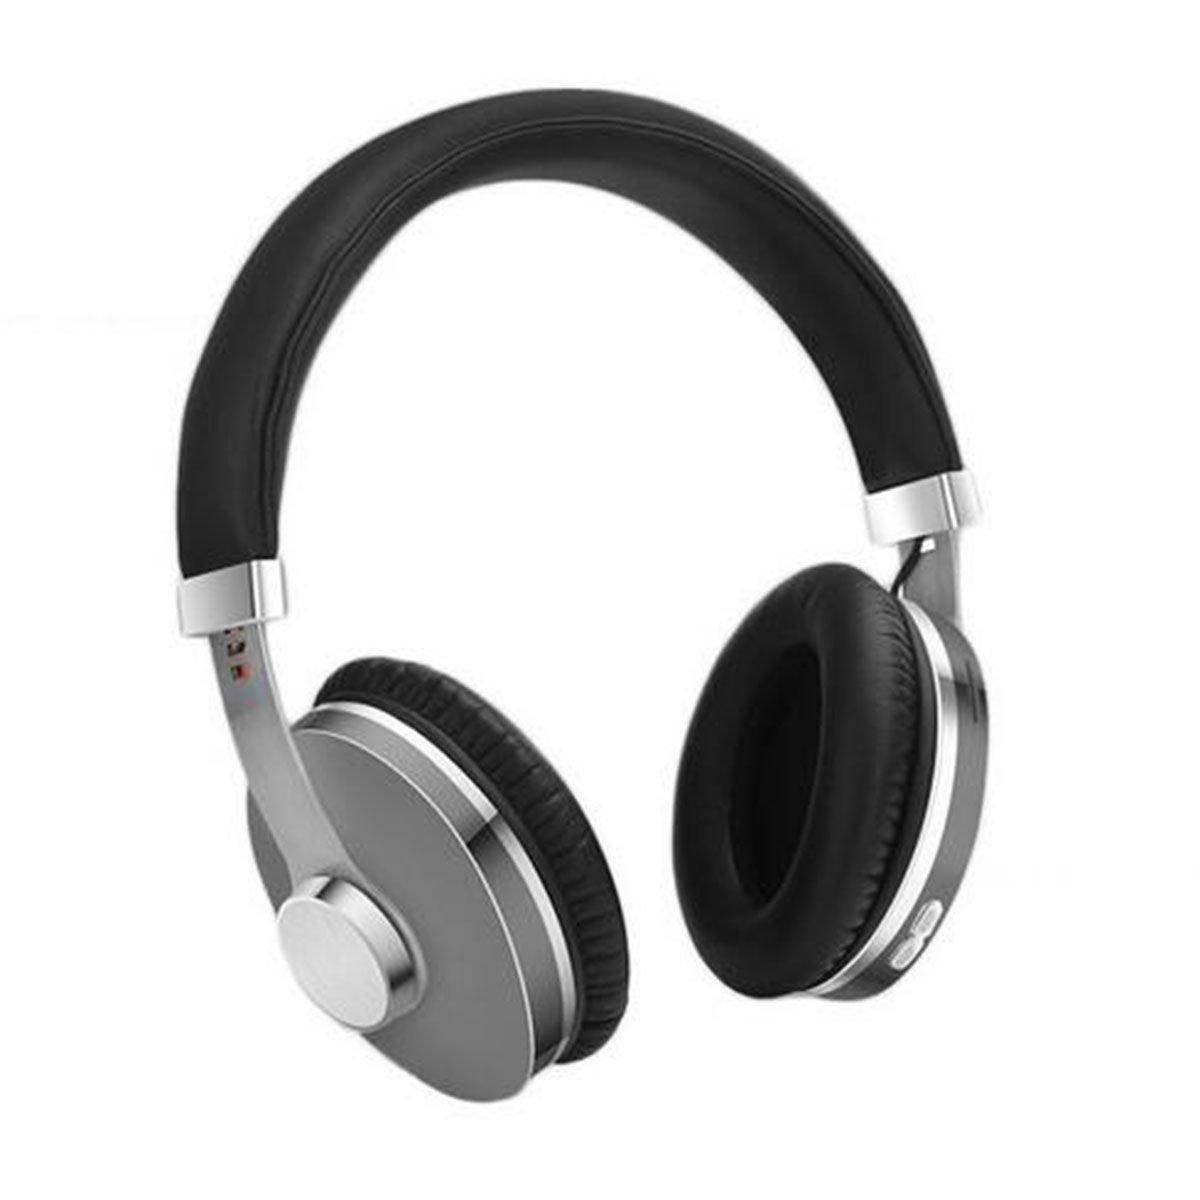 Mai Dou Auriculares Inalámbricos Bluetooth Estéreo De Bajo,Grey: Amazon.es: Electrónica